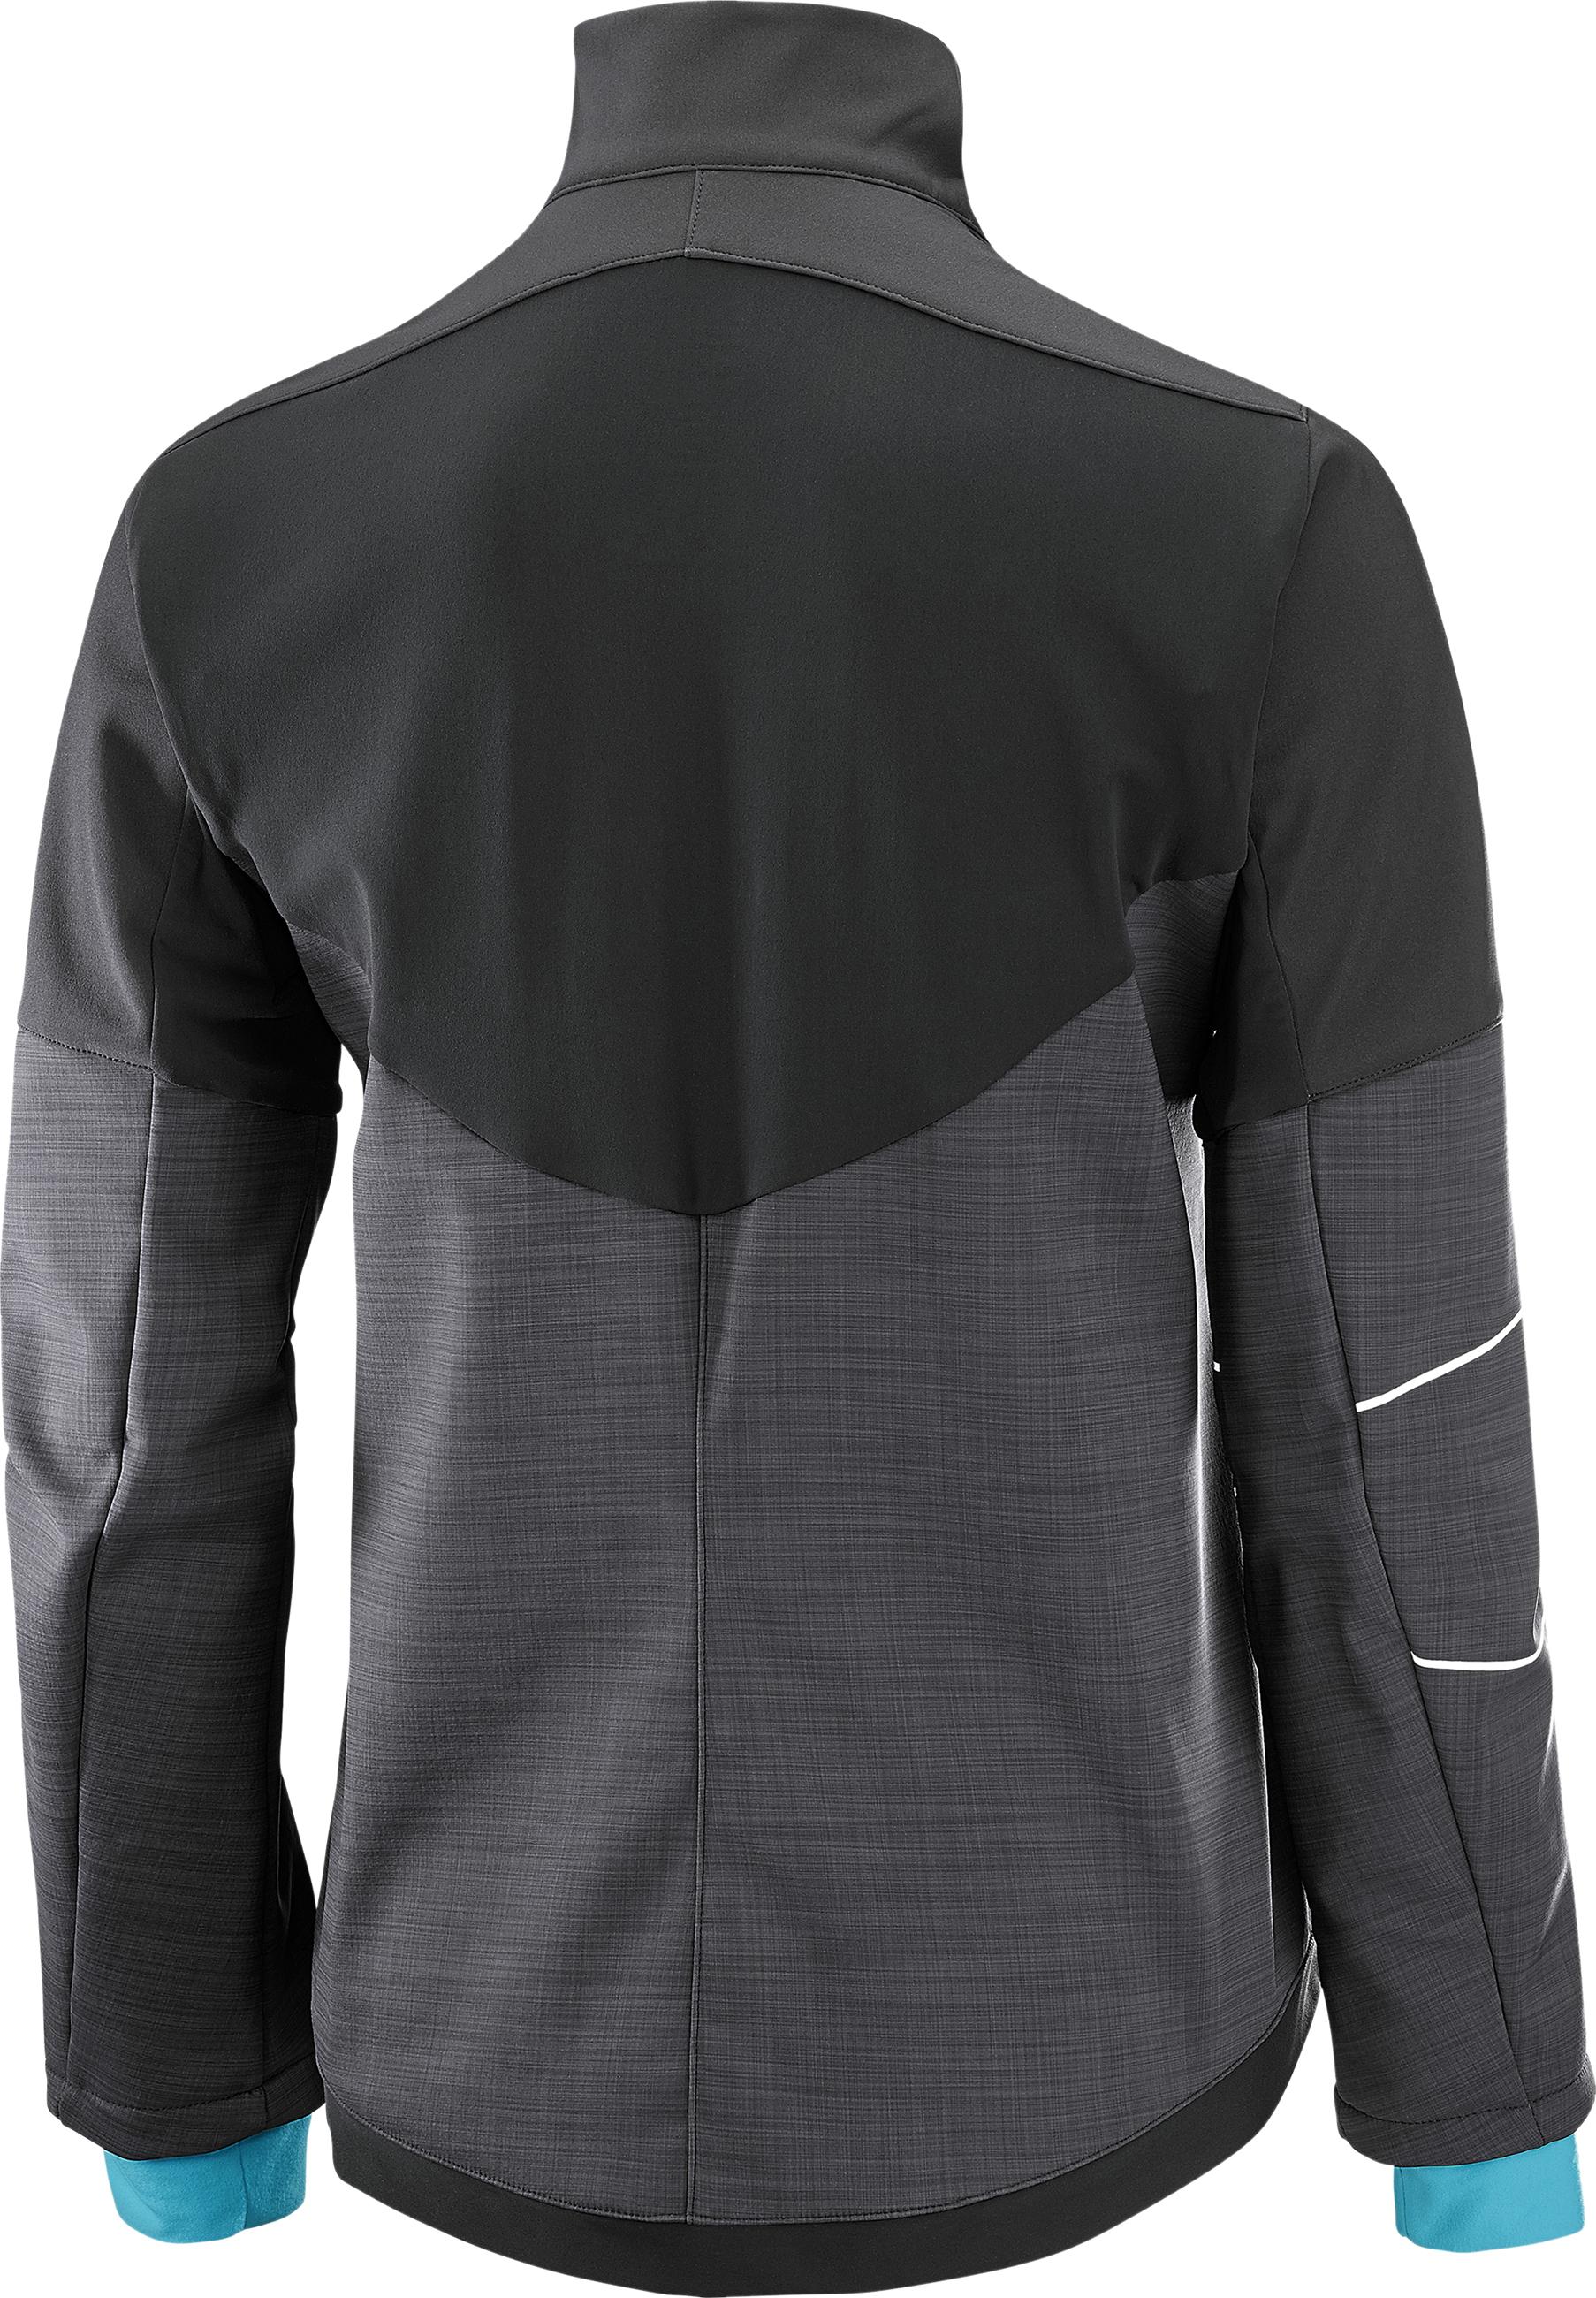 8766f8c7c998 Salomon Elevate Softshell Jacket - Women s